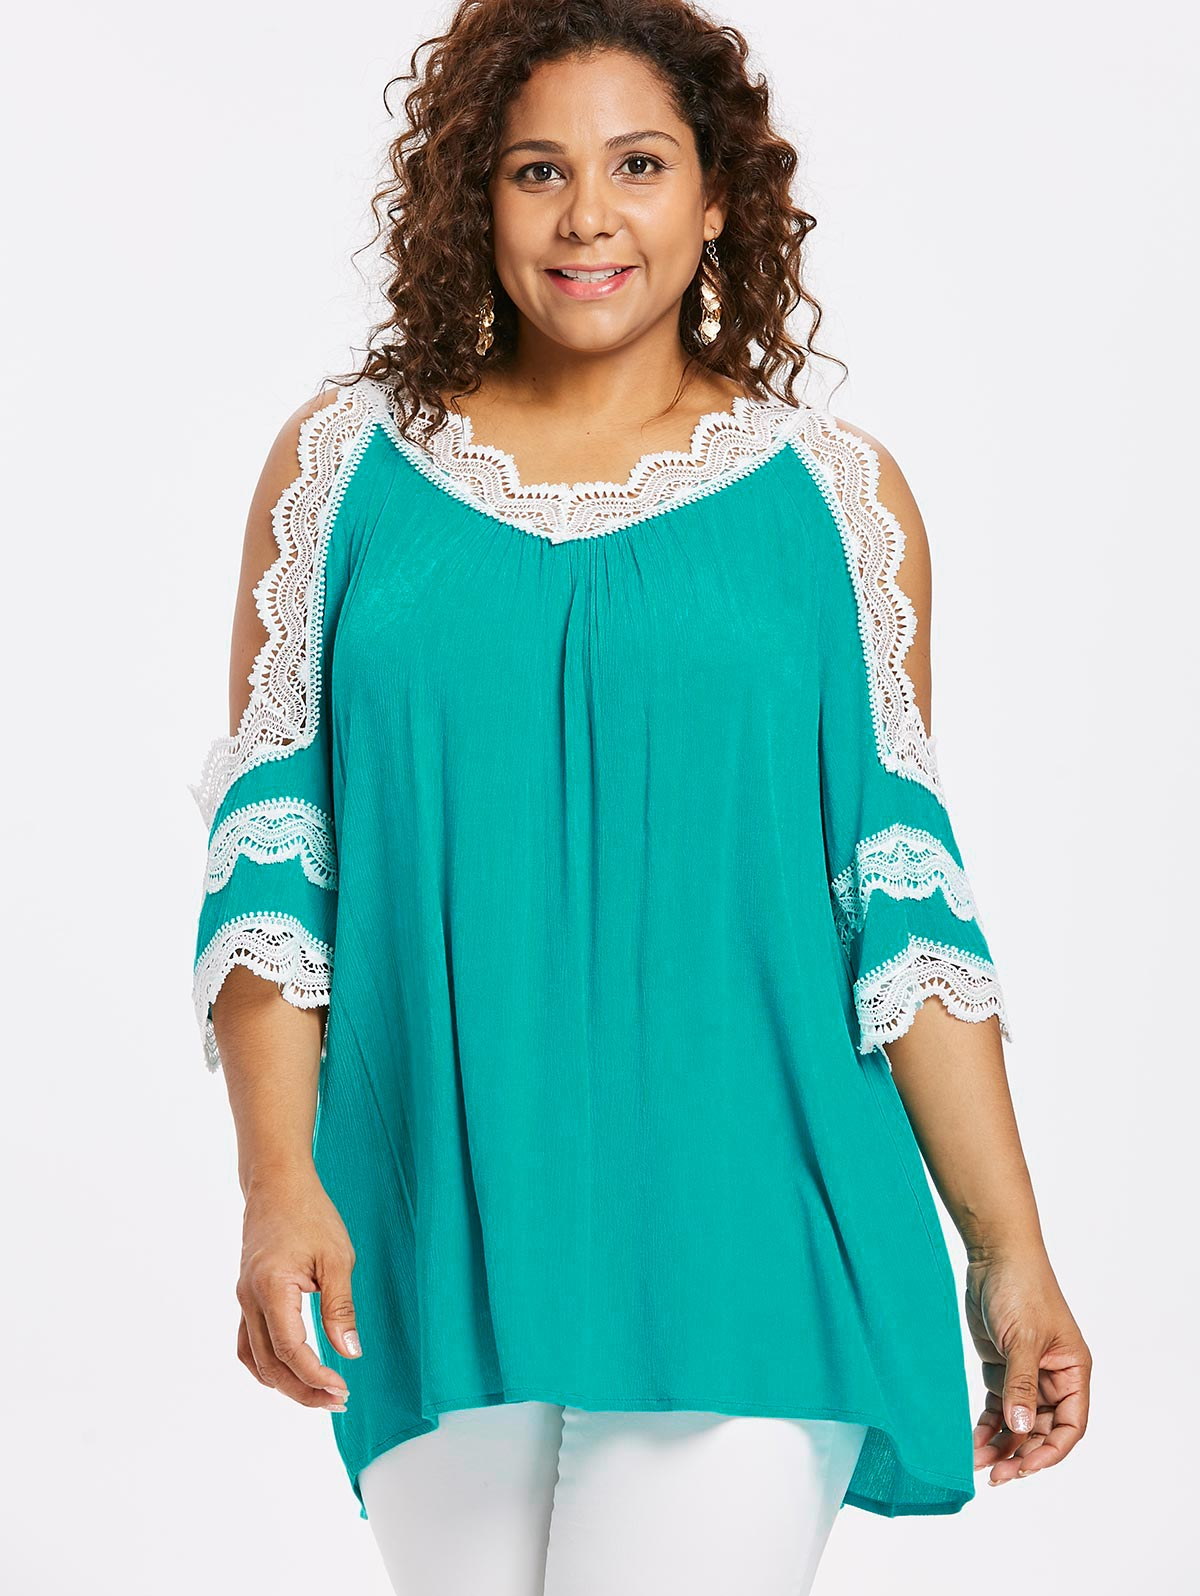 75e9664bb0bb9 Lortalen Plus Size Women Casual Blouses Lace V Neck Cold Shoulder Three  Quarter Sleeve Blouse Ladies Tops Blusas Large Size 5XL-in Blouses & Shirts  ...